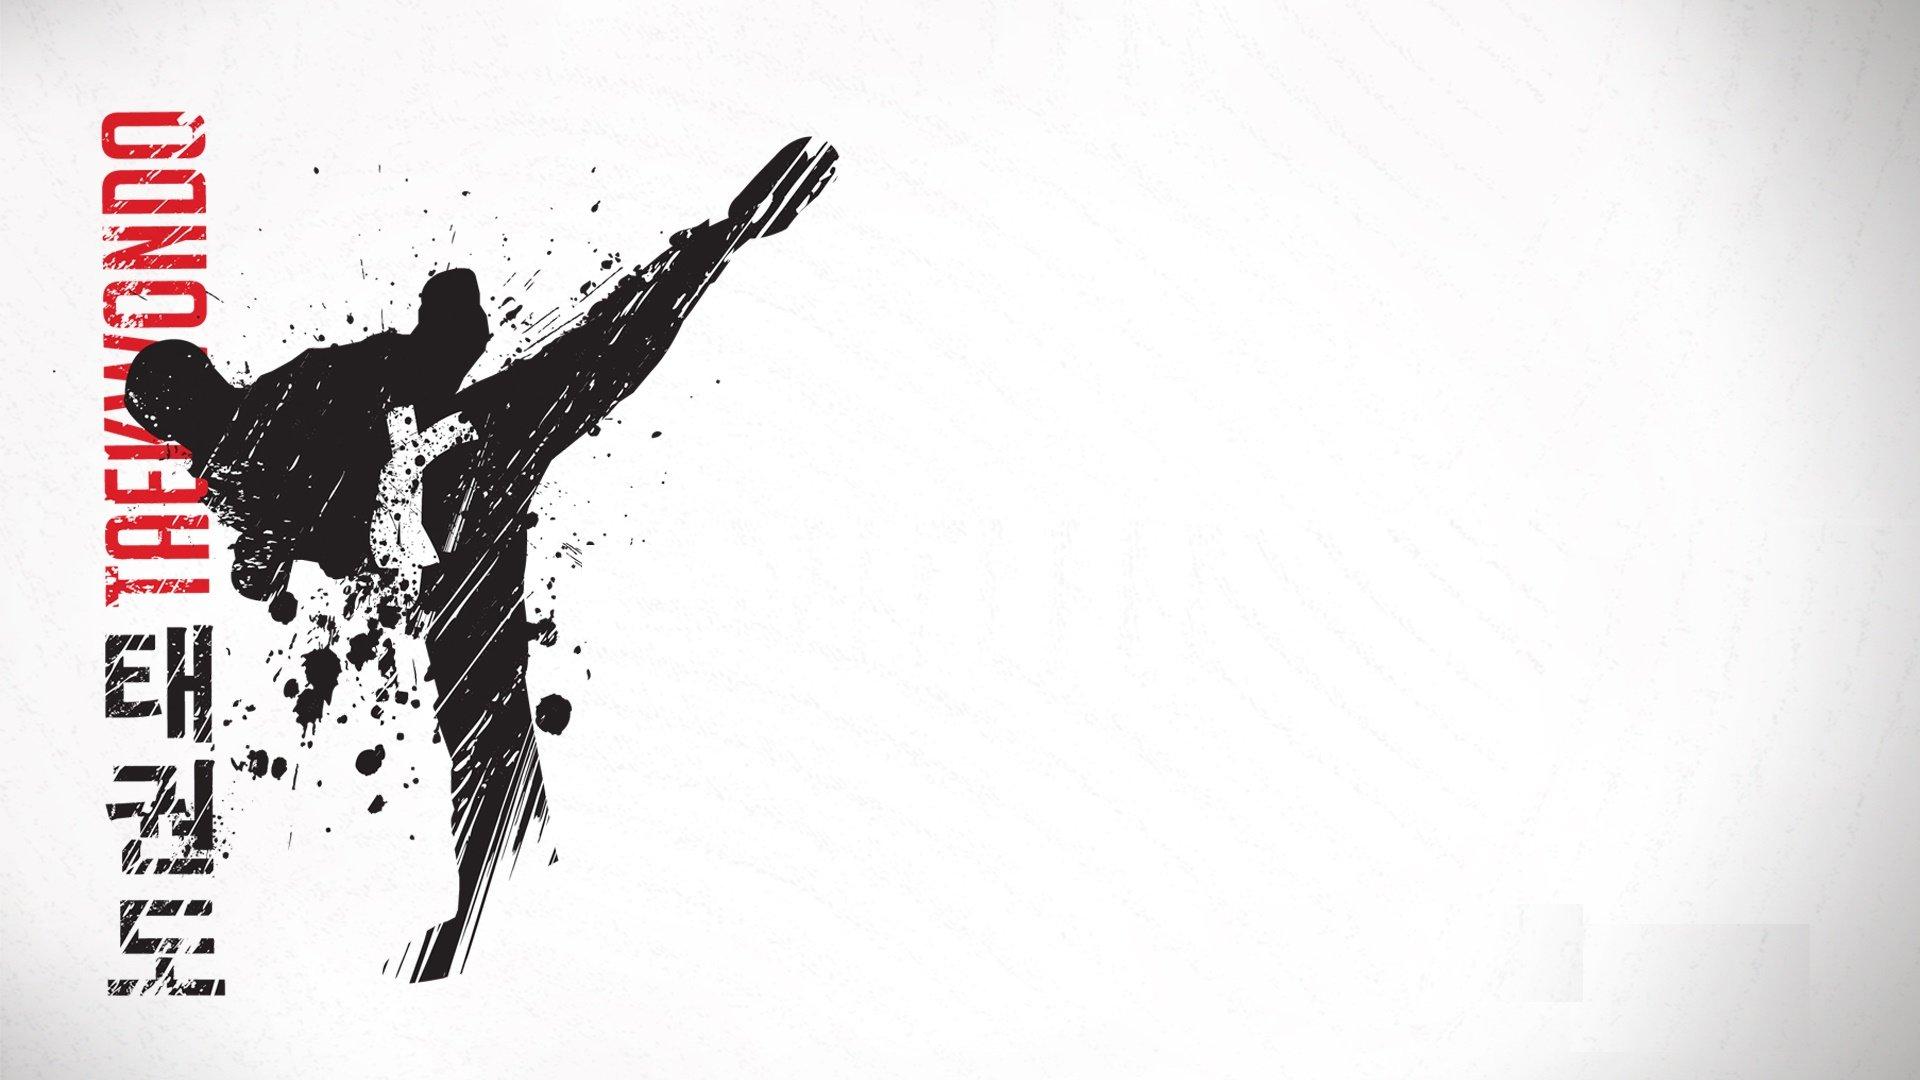 download Taekwondo Desktop Wallpaper [1920x1080] for your 1920x1080